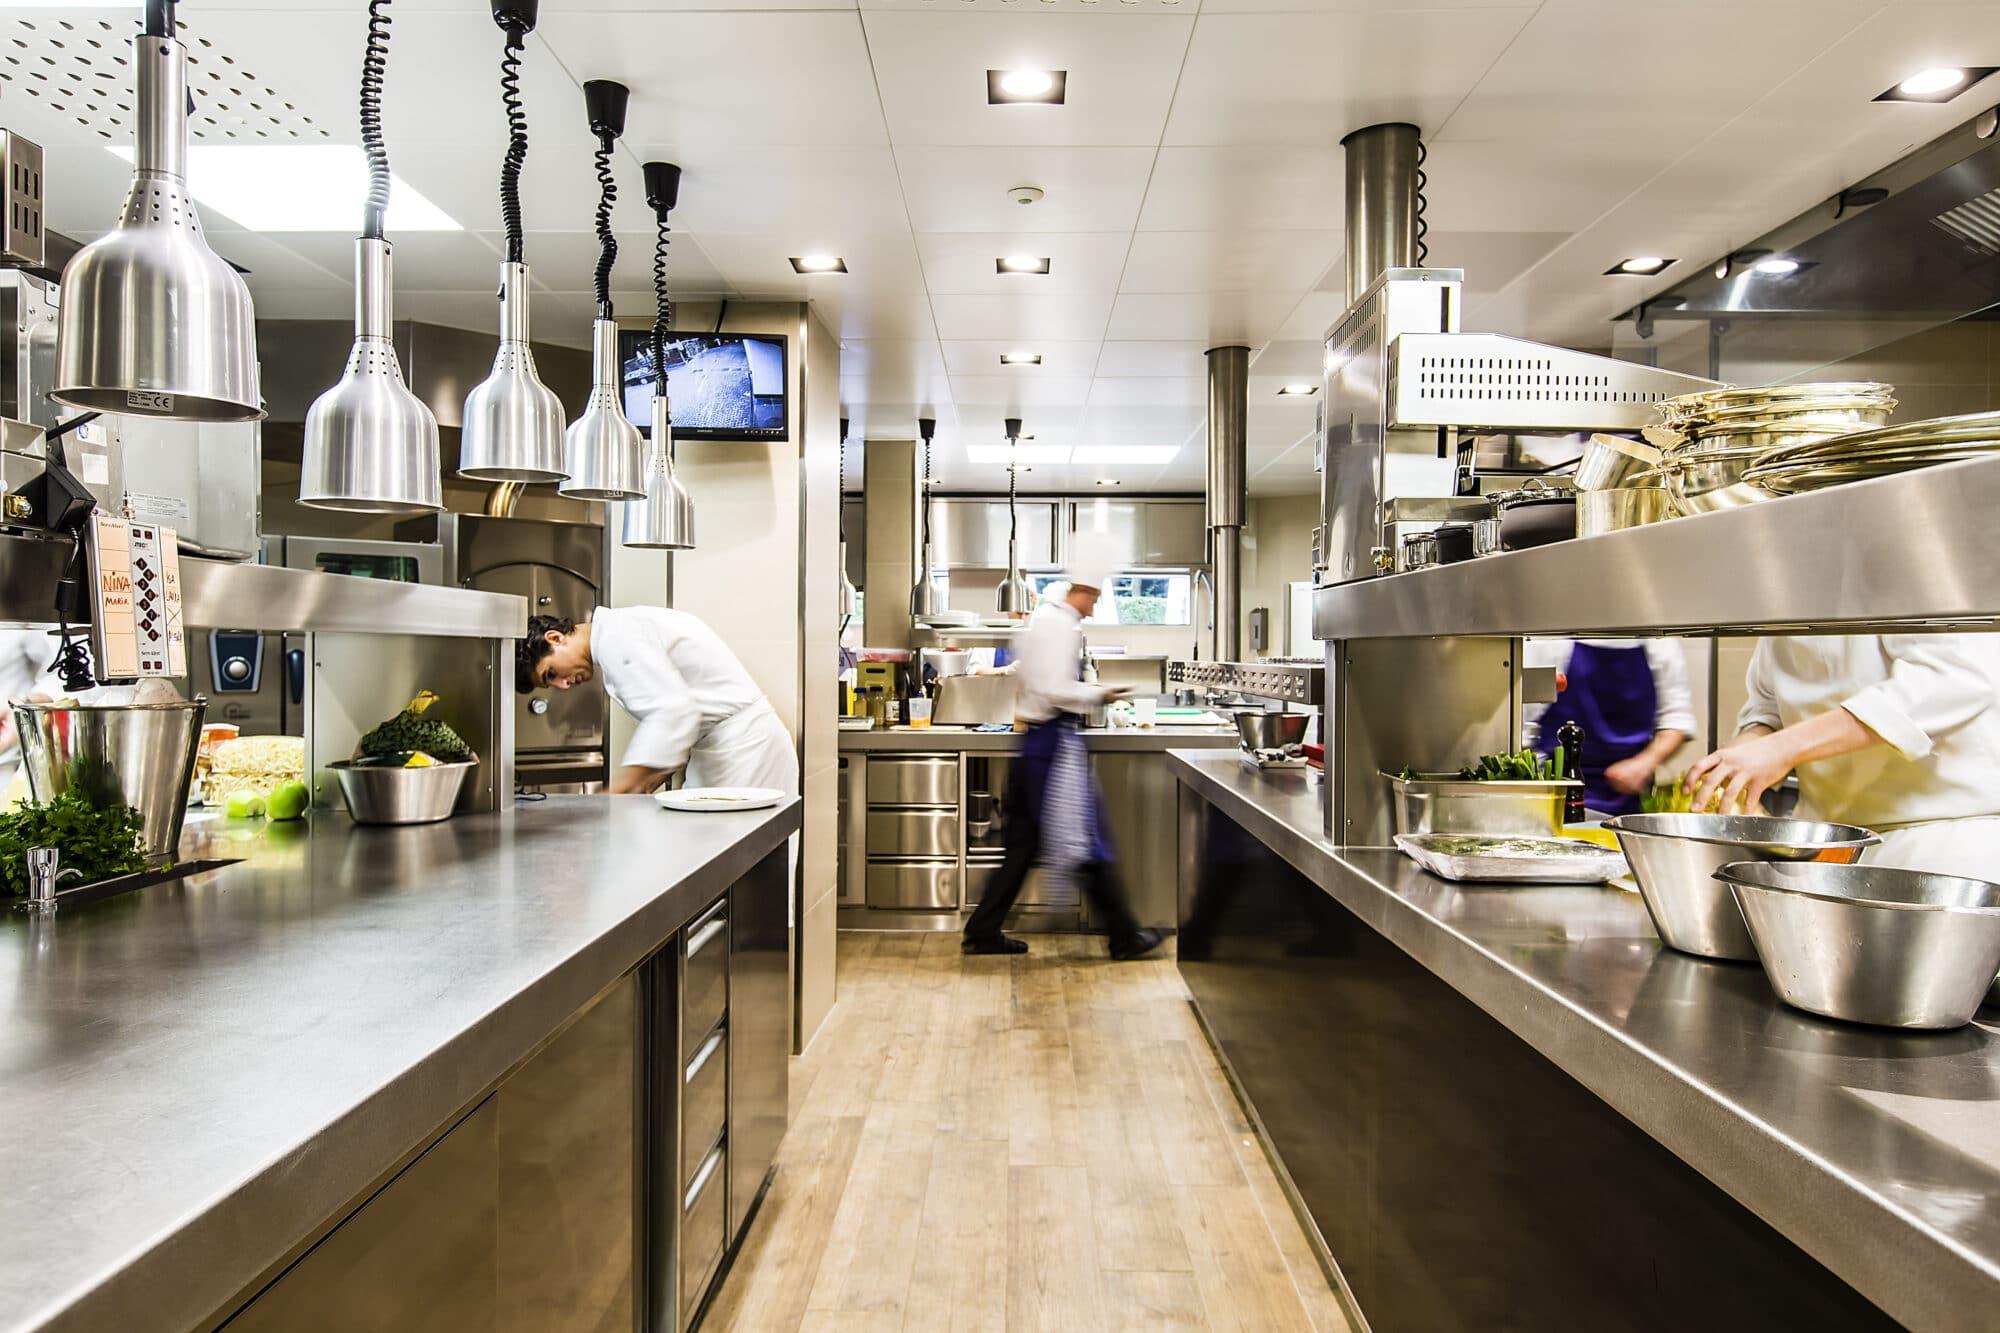 Onderhoud in professionele keukens